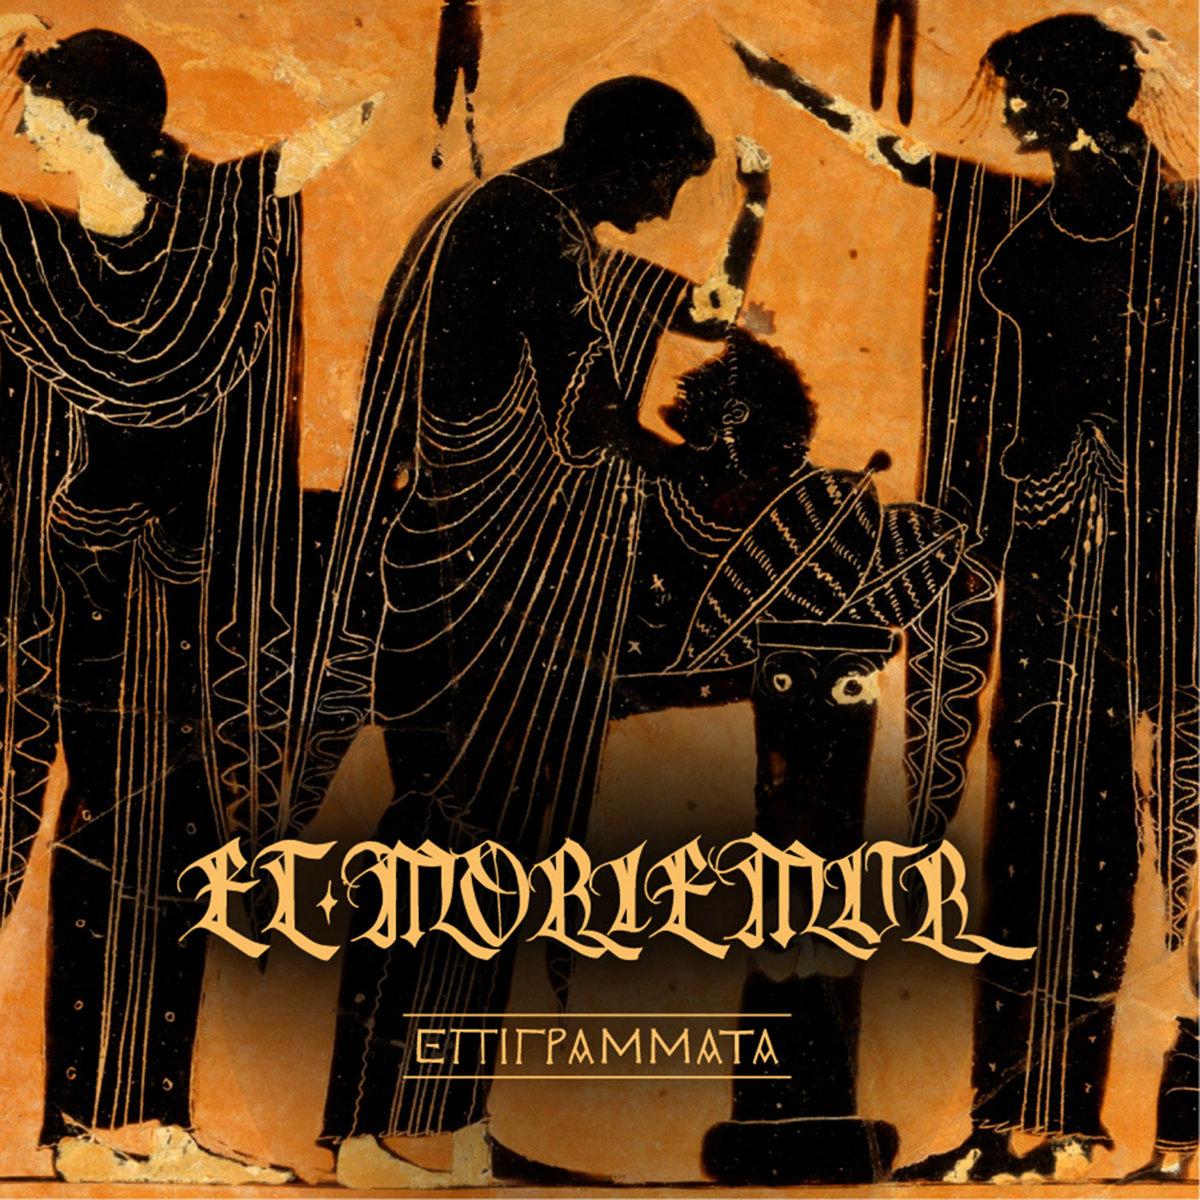 Recenze: Et Moriemur – Epigrammata